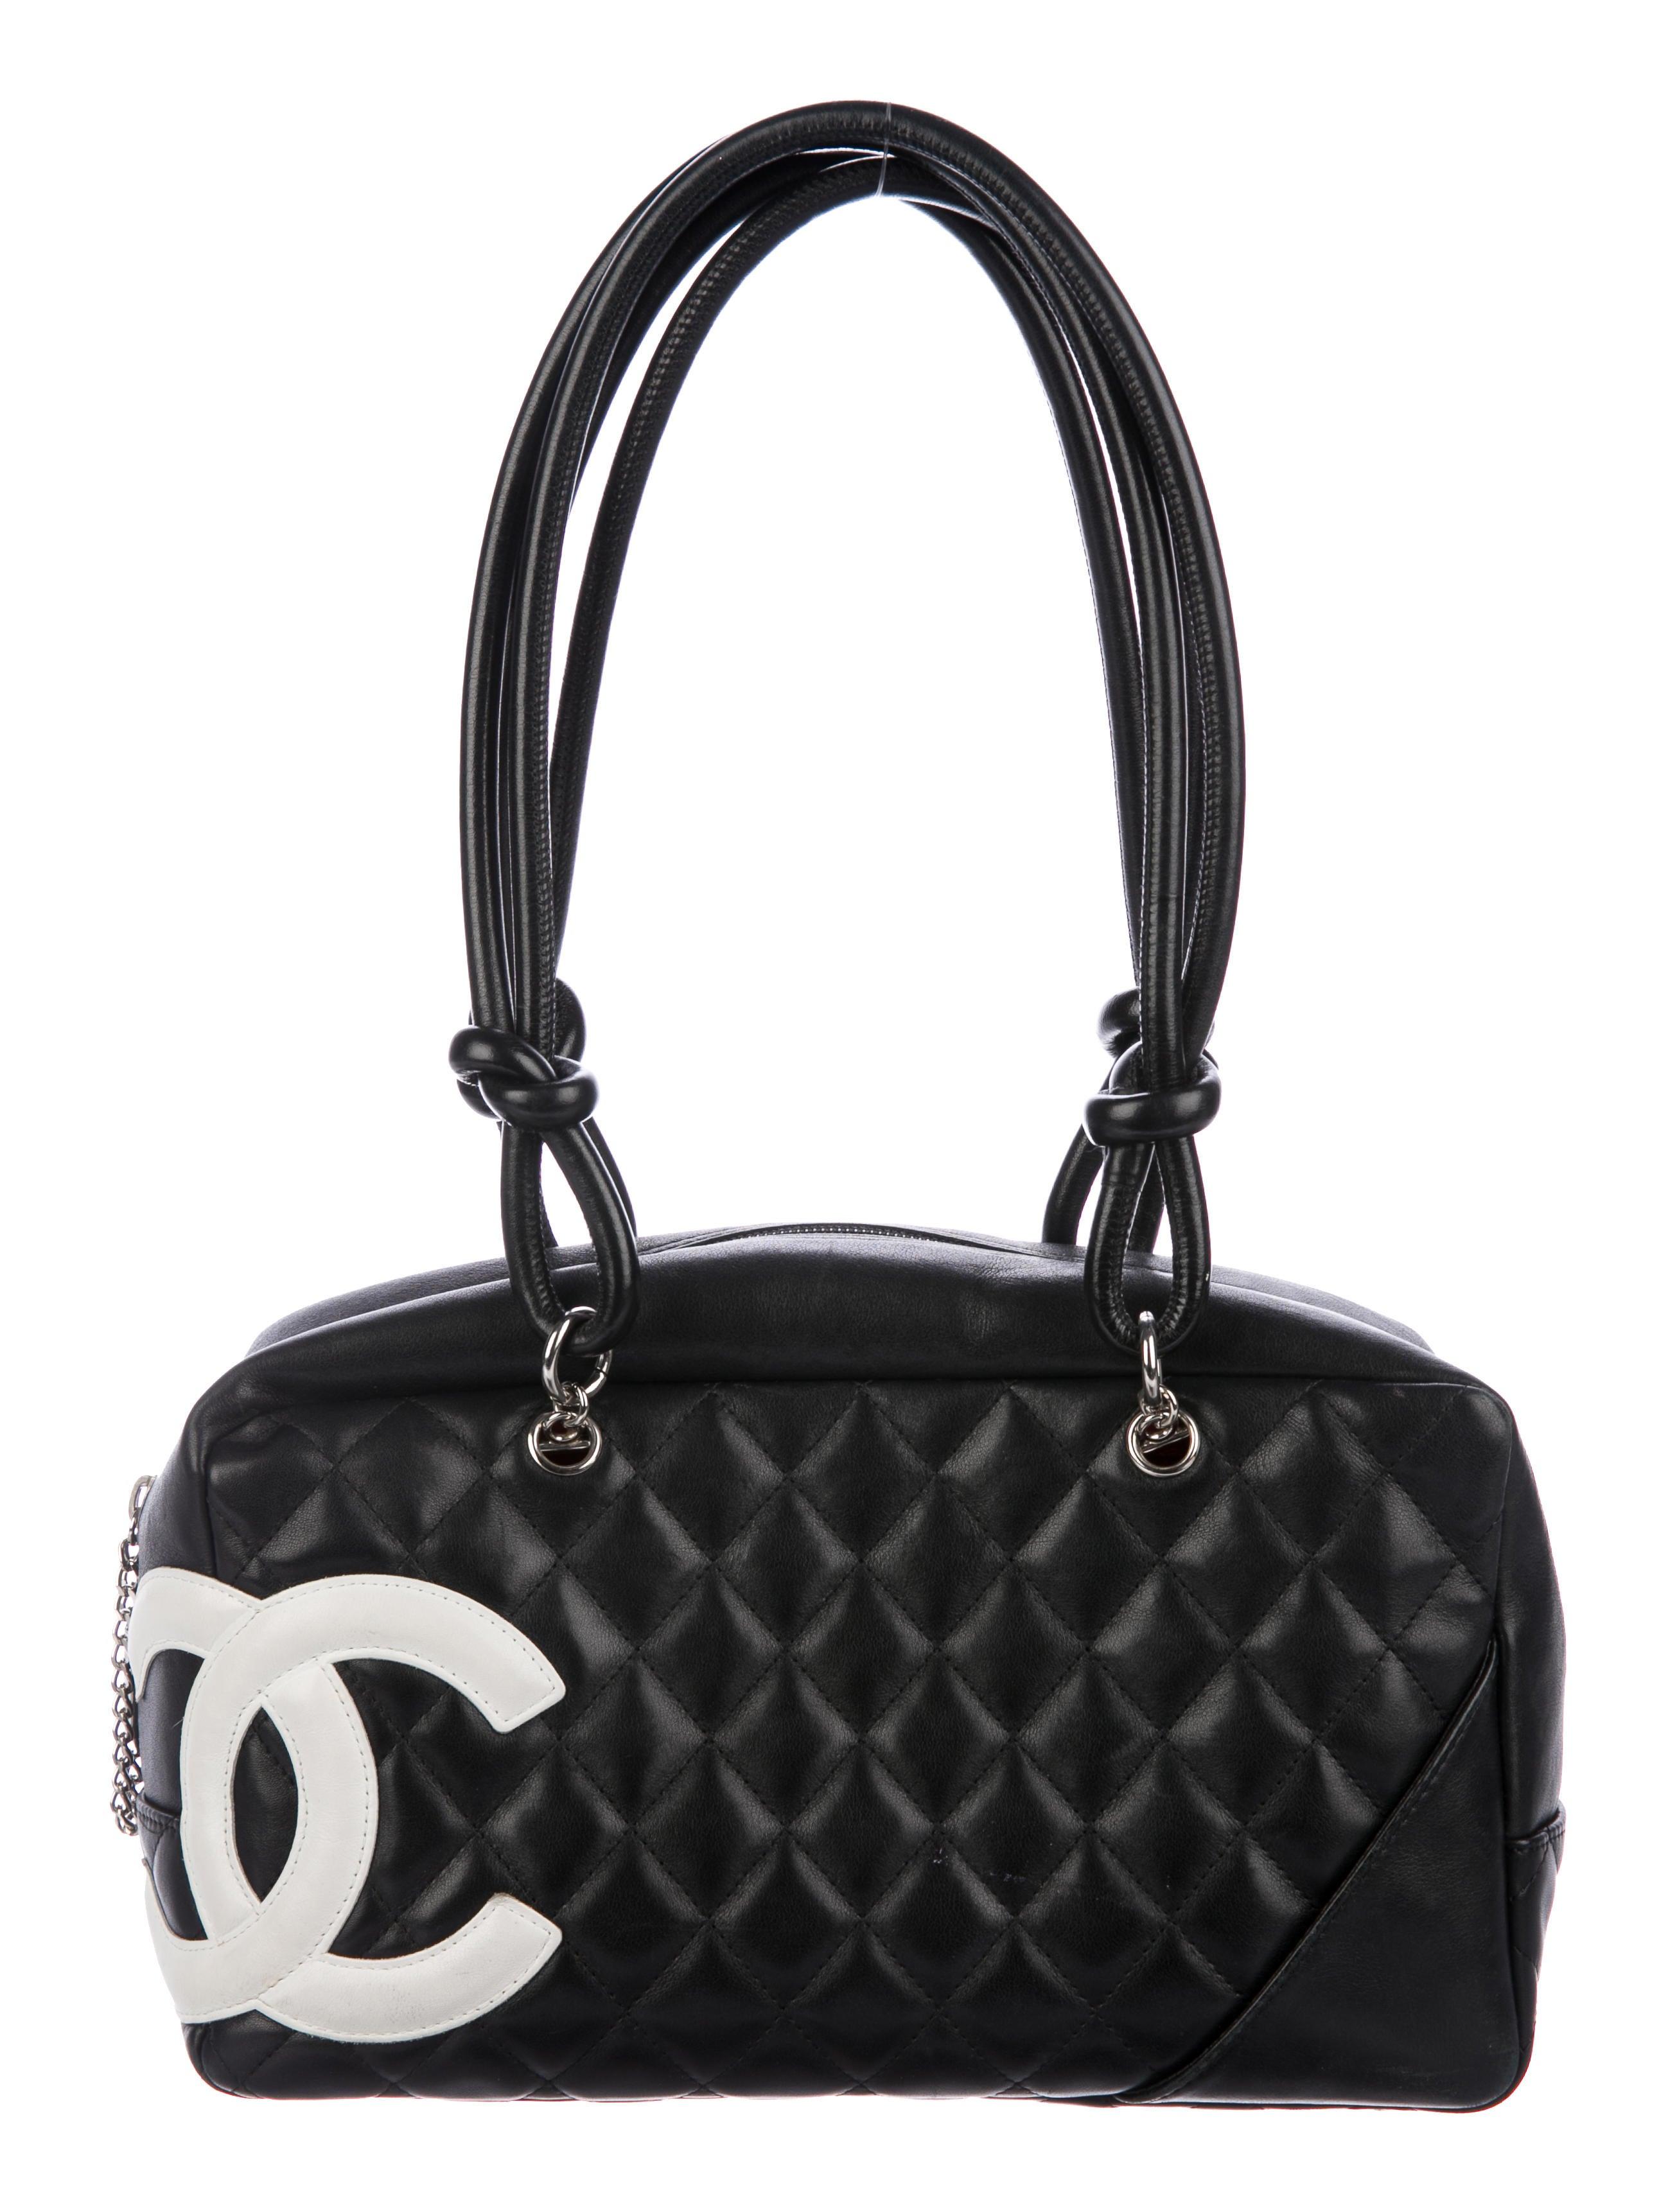 6a00e54160b6 Chanel Ligne Cambon Reporter Bag - Handbags - CHA235873